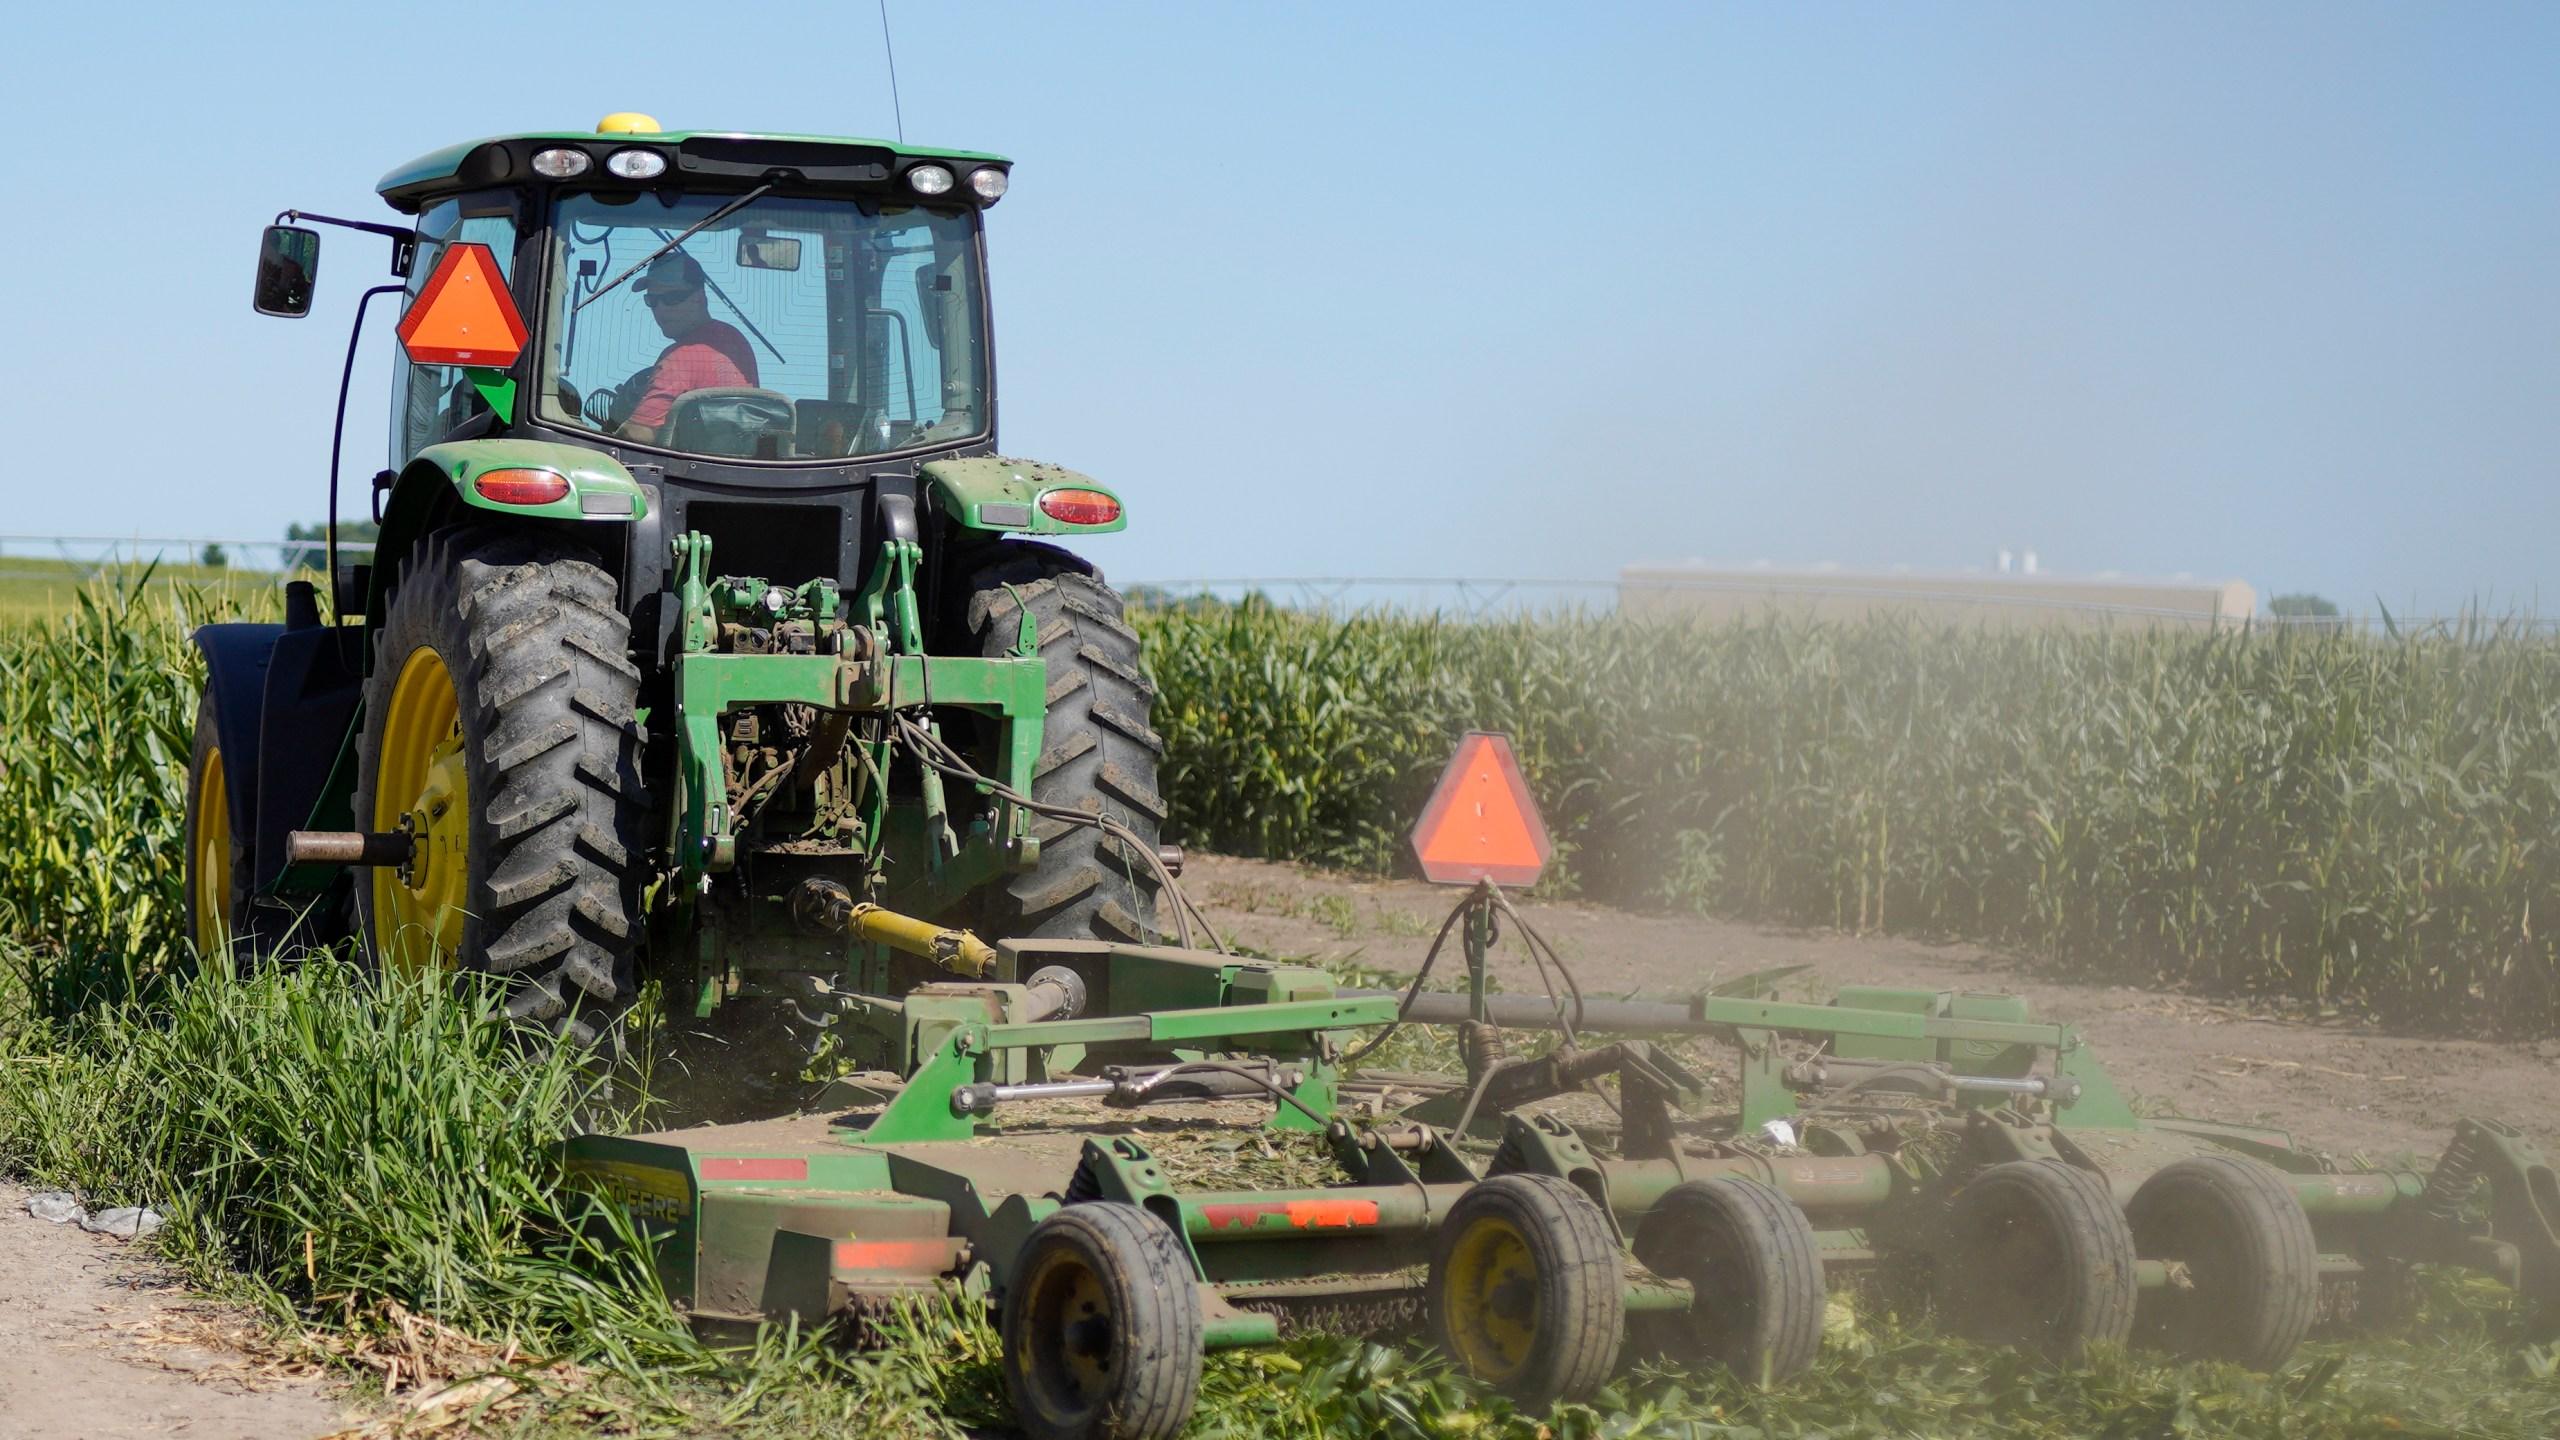 Trump_Trade_Farmers_62660-159532.jpg26564970